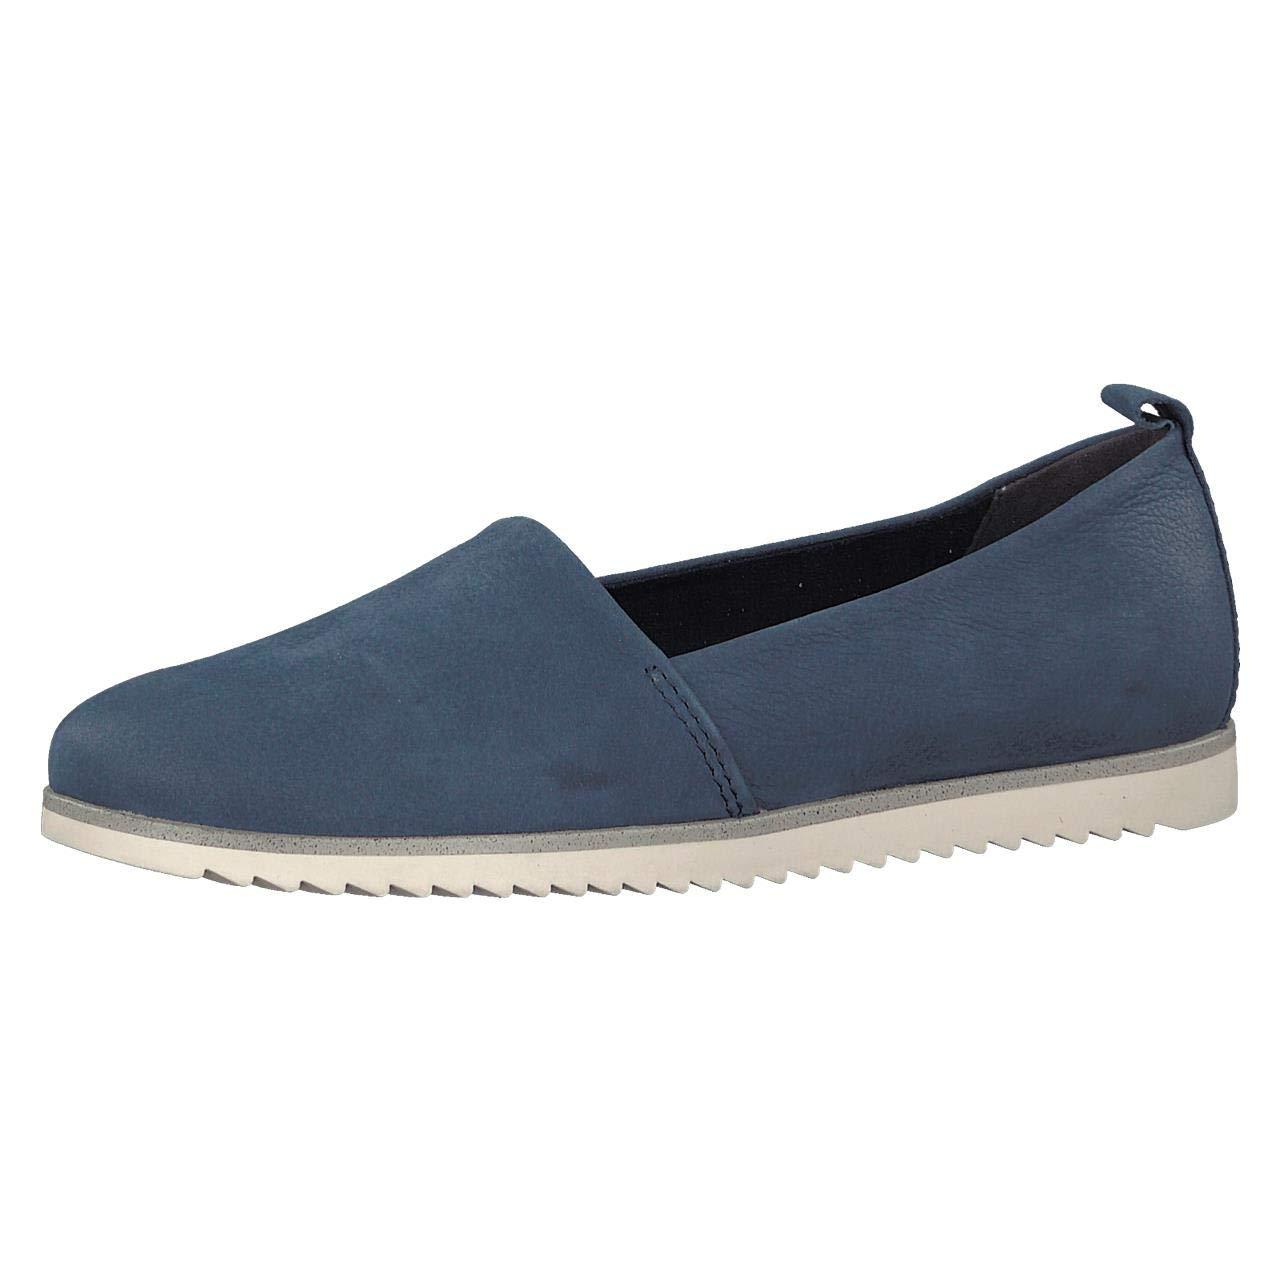 MARCO TOZZI Damen Slipper blau 2-2-24603-20/892 blau Slipper 411884 Blau 3c0e84